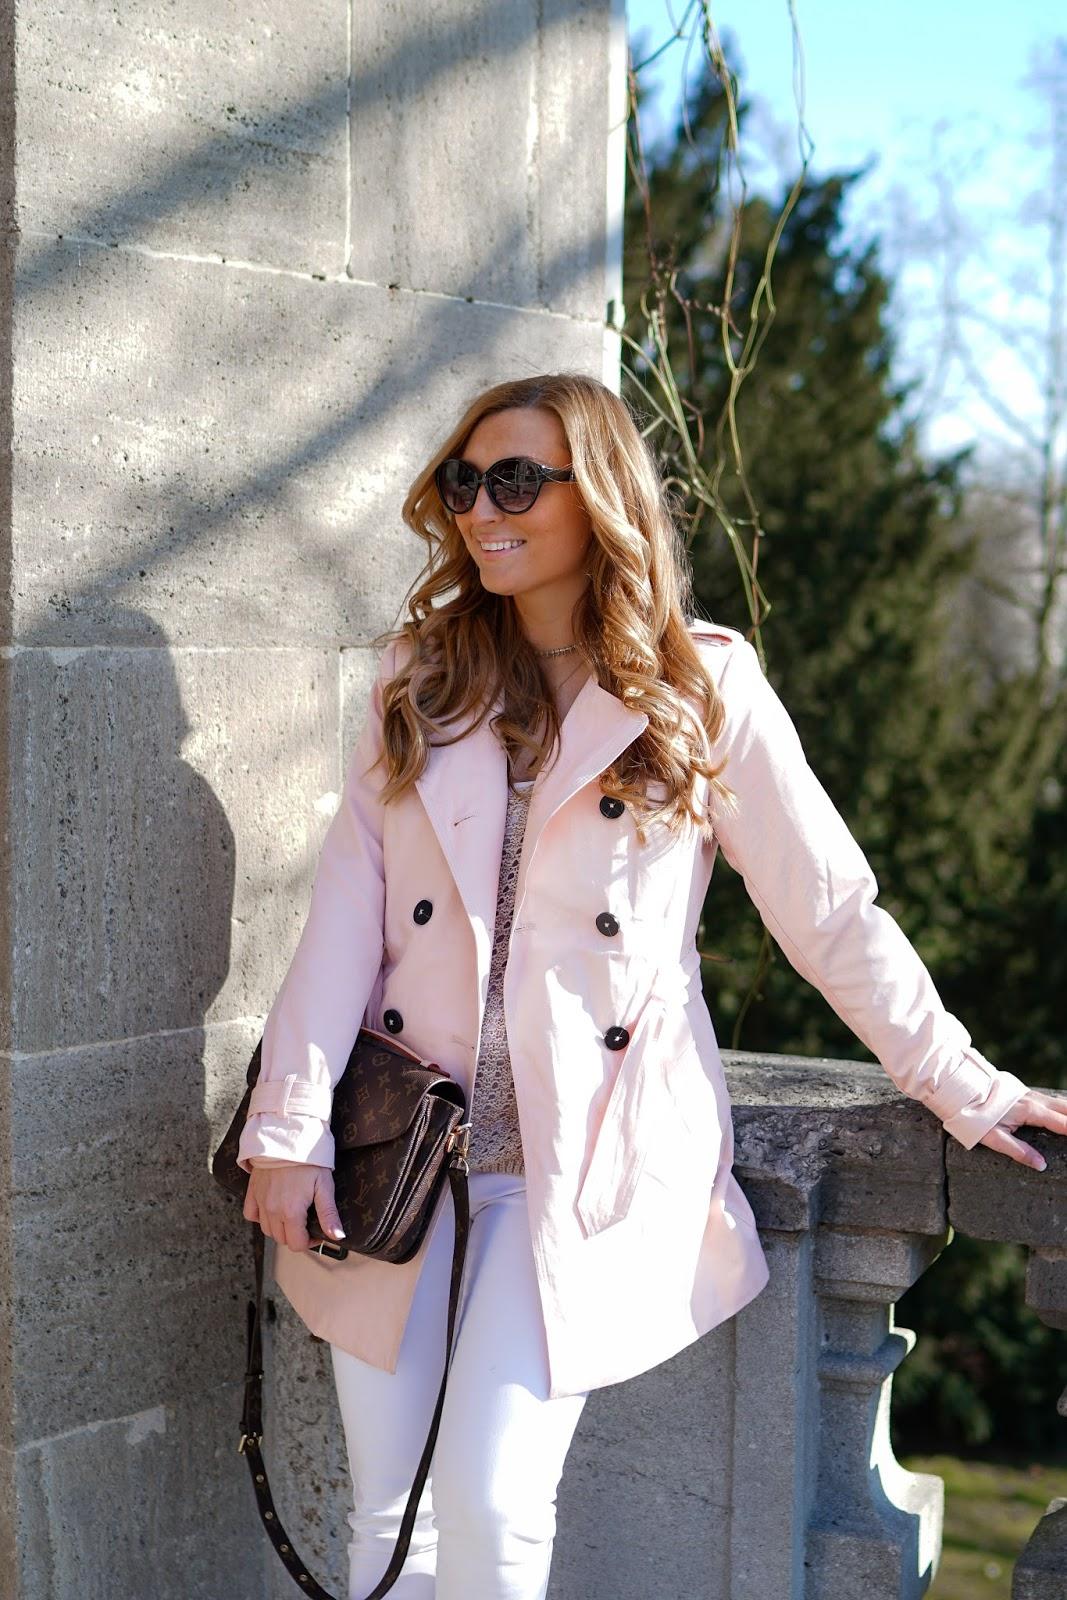 LV-Mettis-tasche-streetone-Pastellfarbener-Trenchcoat-Frühlingslook-Blogger-Trend-Trendjacke-was-ist-aktuell-angesagt-trenchcoat-fashionstylebyjohanna-blogger-aus-frankfurt